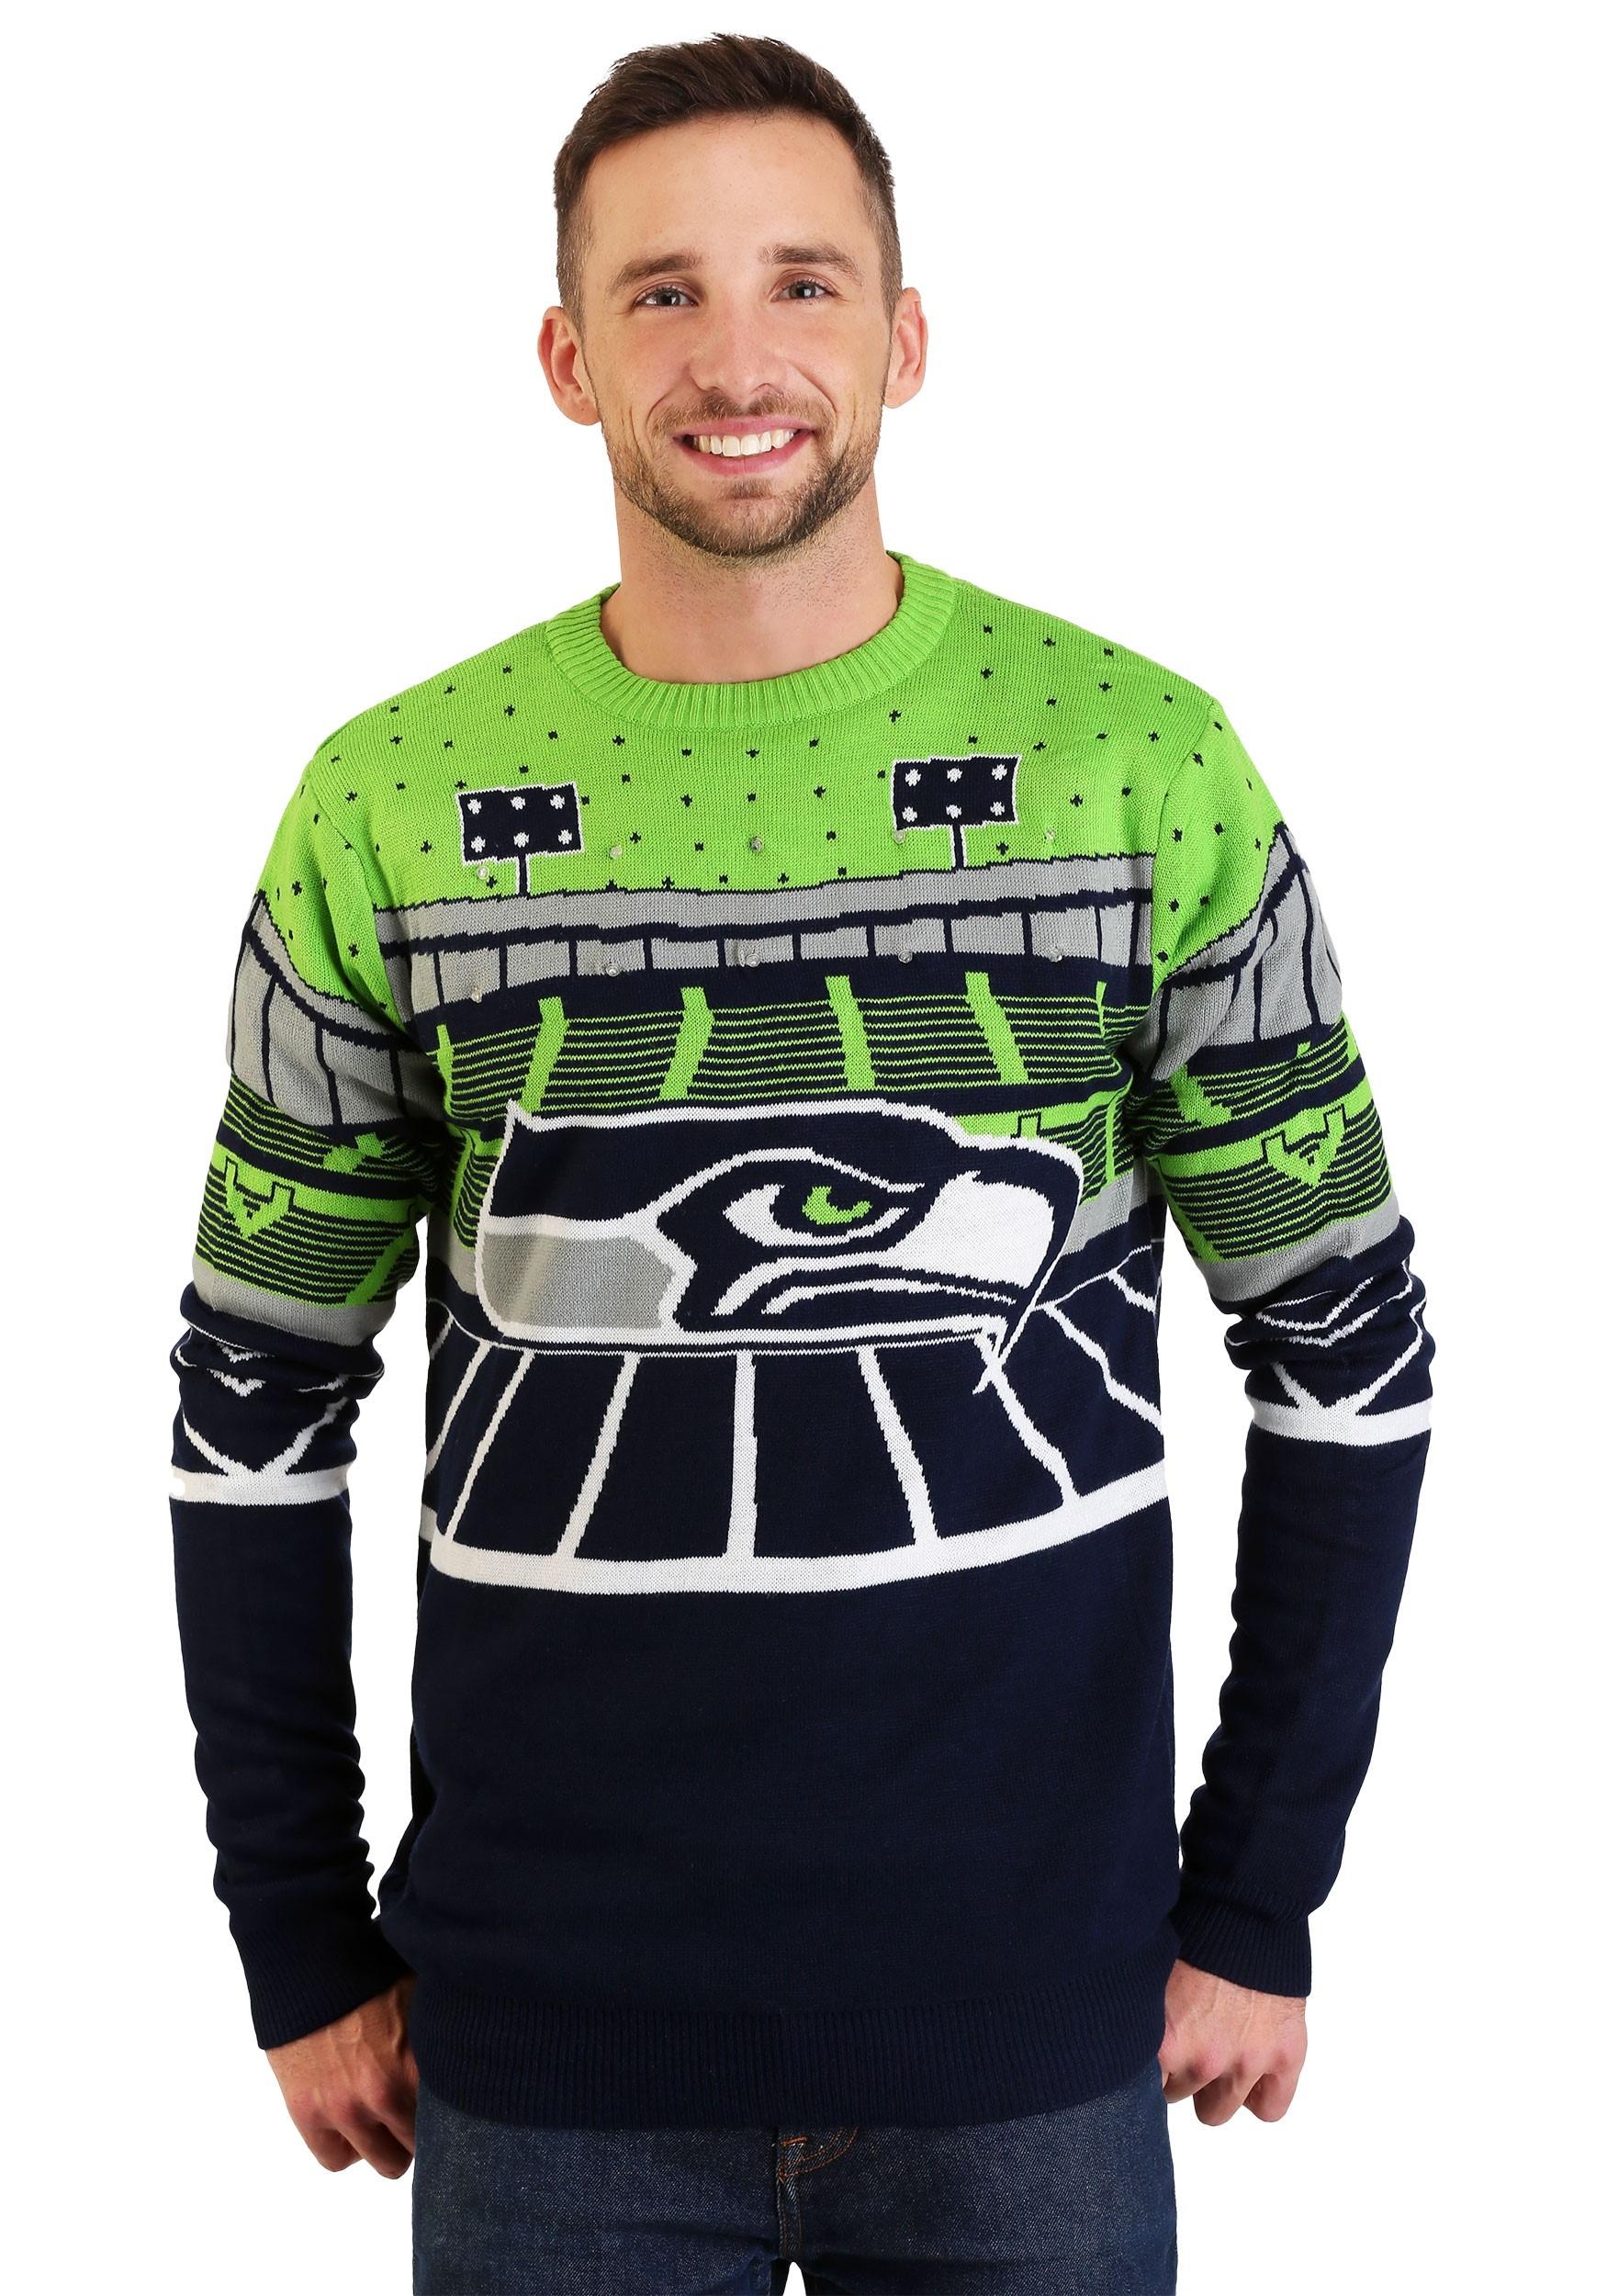 Seahawks Christmas Lights.Seattle Seahawks Light Up Bluetooth Ugly Christmas Sweater